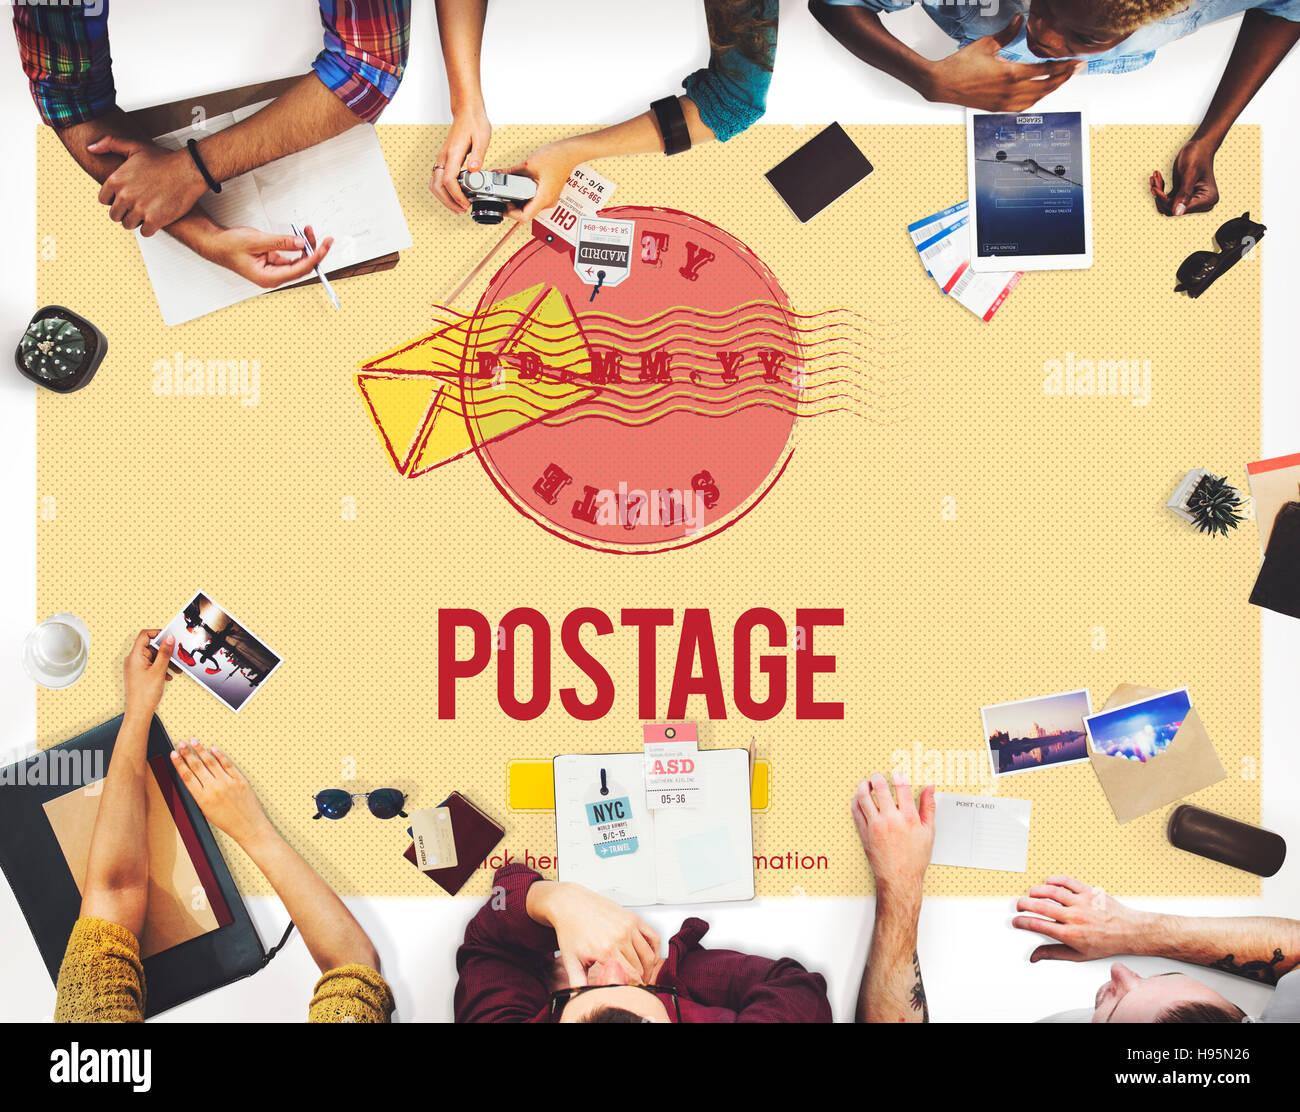 Postage Postal Stamp Delivery Postmark Concept - Stock Image